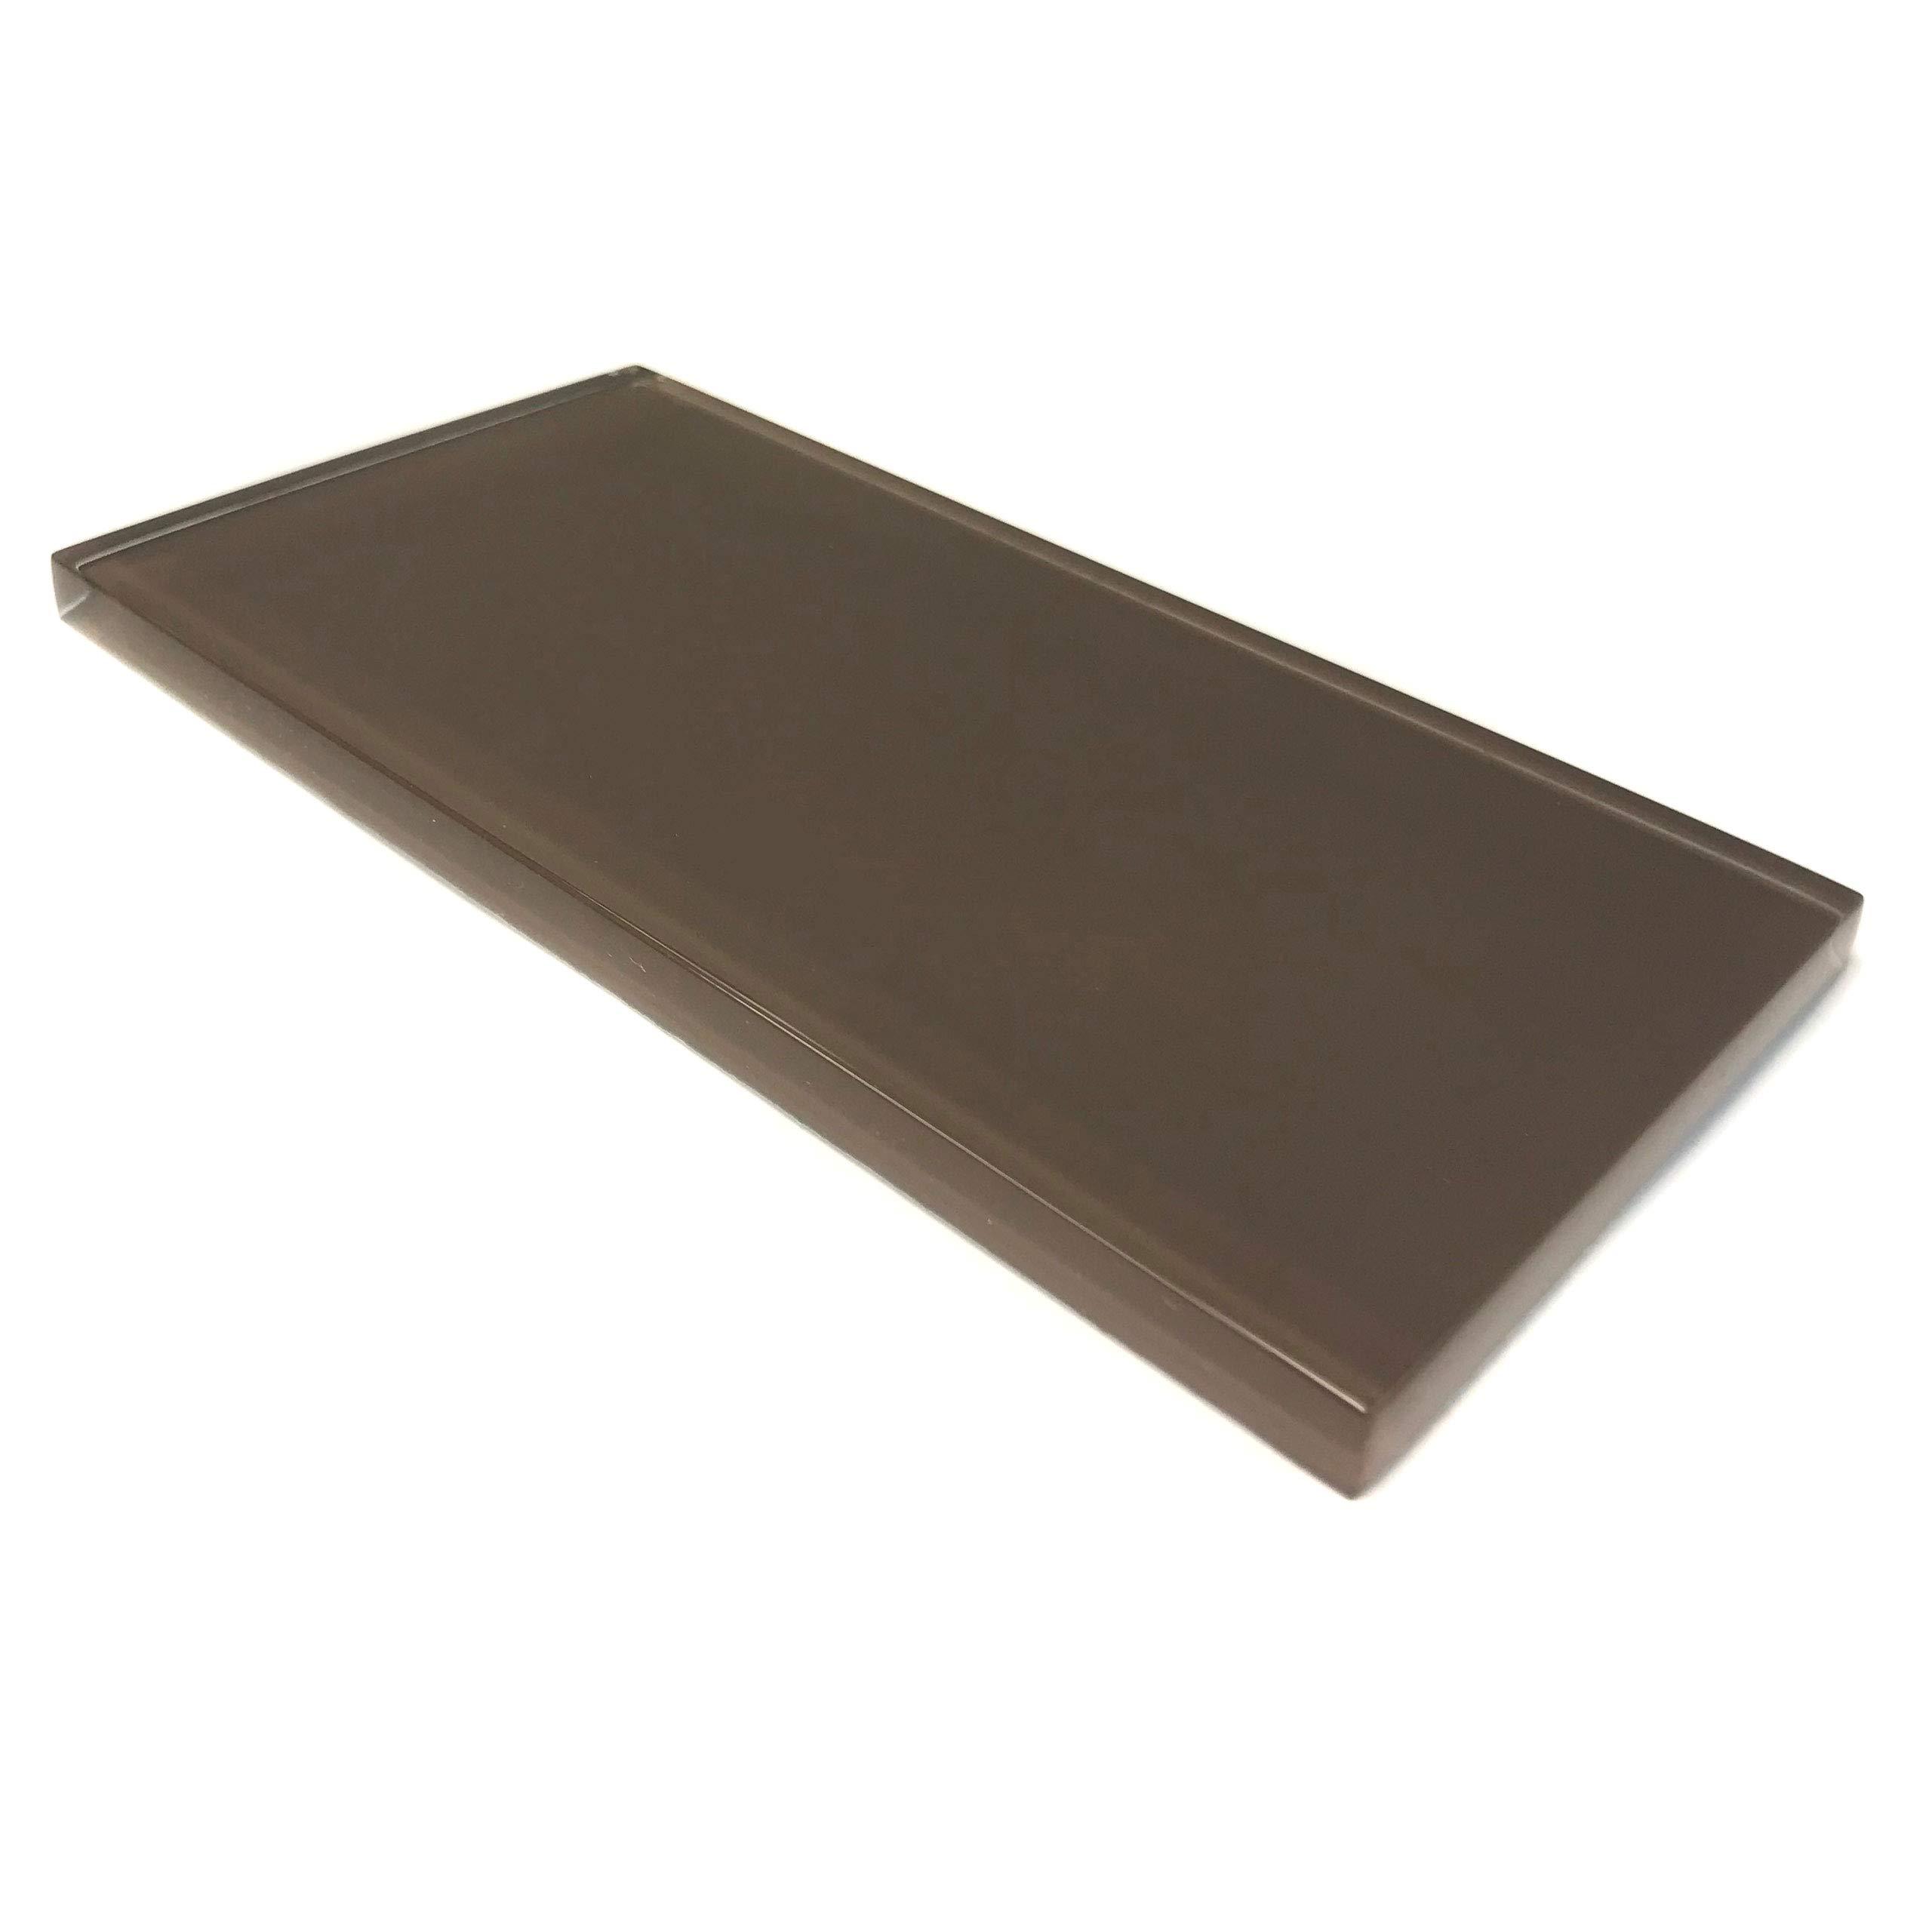 Giorbello Glass Subway Backsplash Tile, 3 x 6, Classic Brown, Sample Tile (1 Piece)